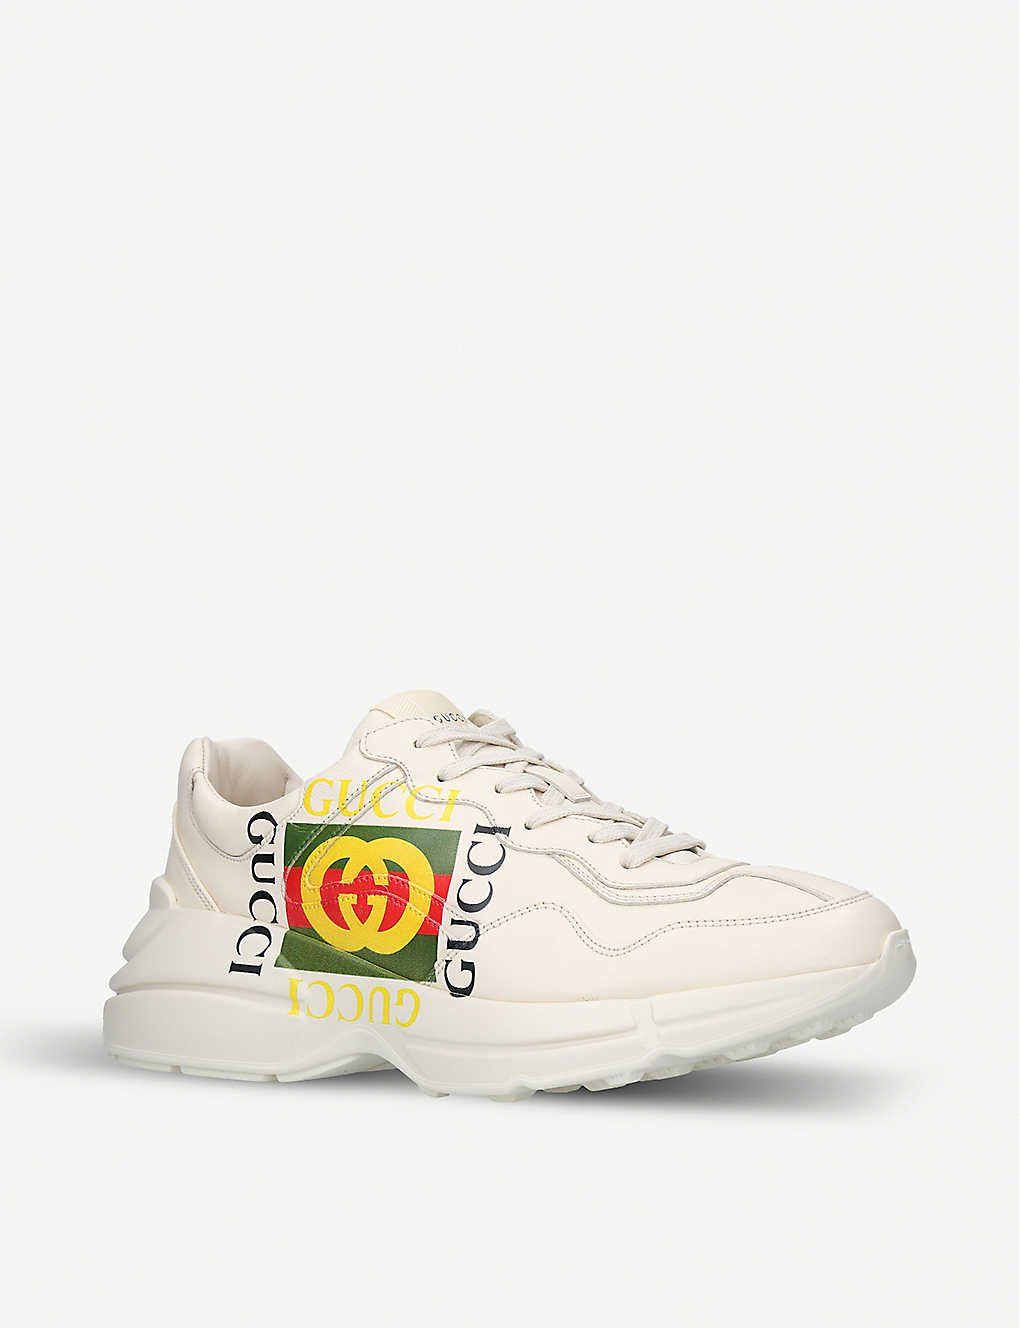 2ab8432608f ... Mens rhyton GG leather running trainers - Whitecomb ...